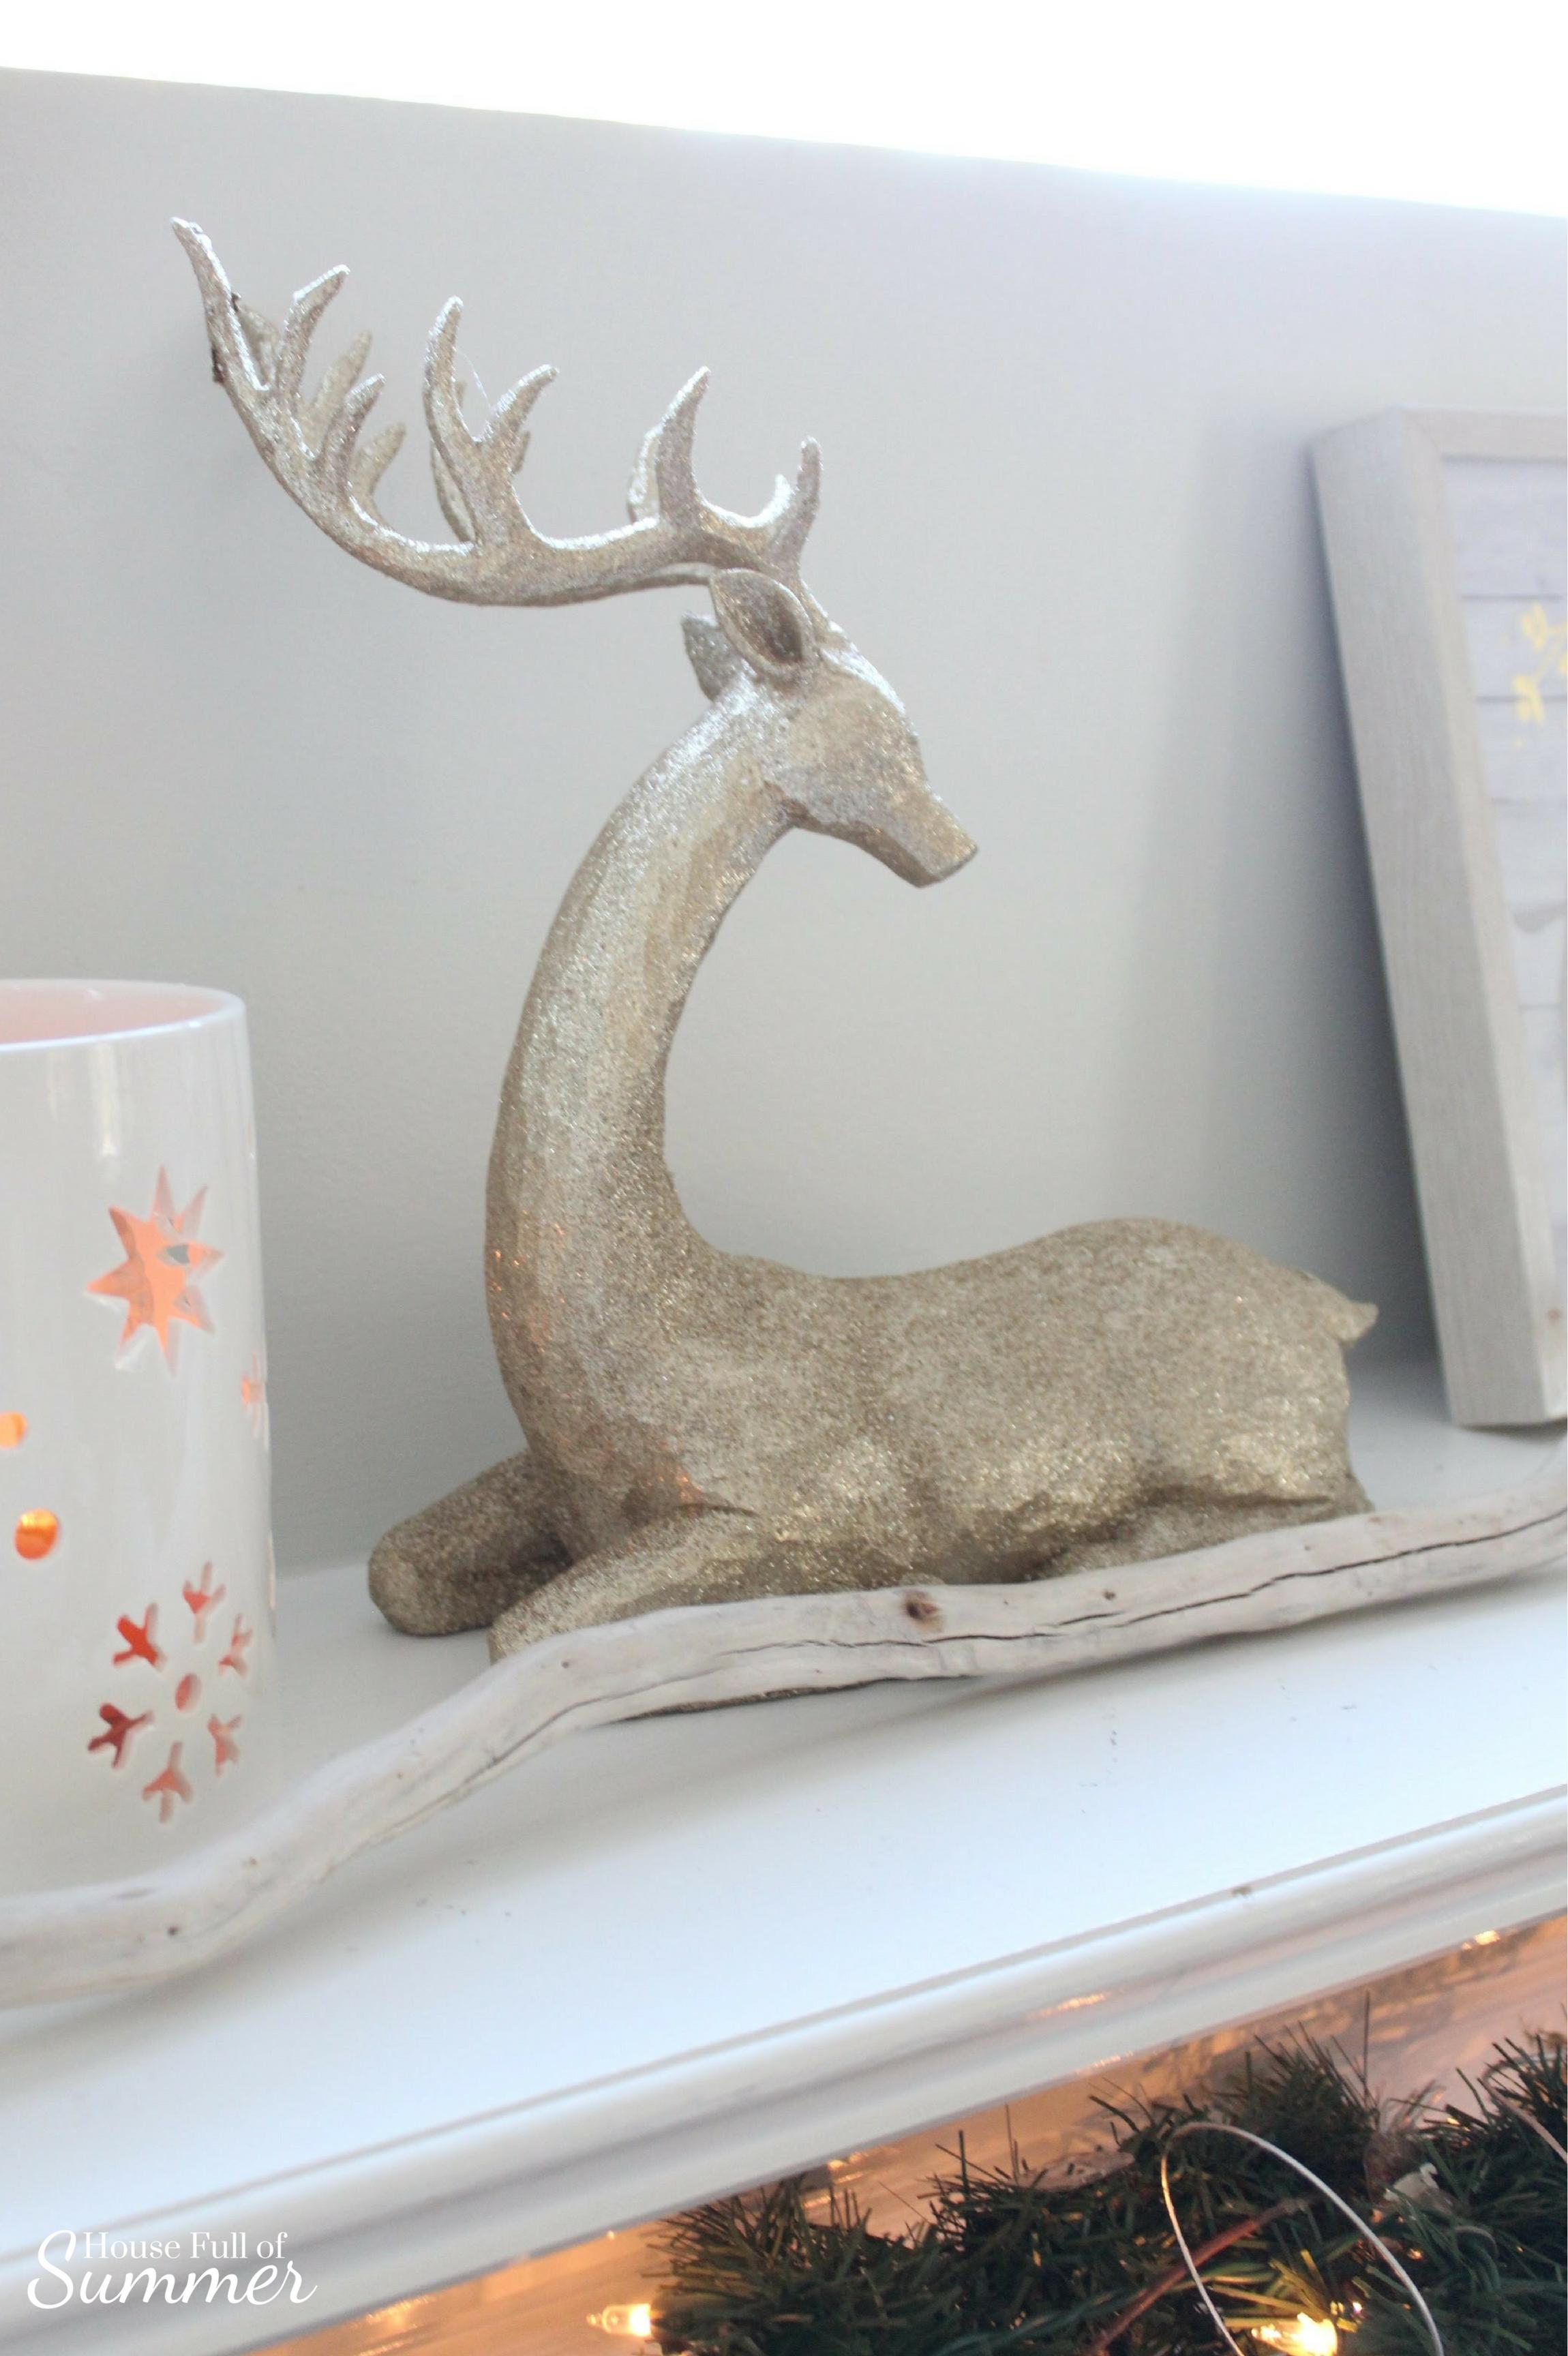 Classy Christmas Home Tour {Part Two} | House Full of Summer blog - mantel decor, christmas mantel ideas, coastal christmas mantel, silver and gold coastal decor, windows over mantel